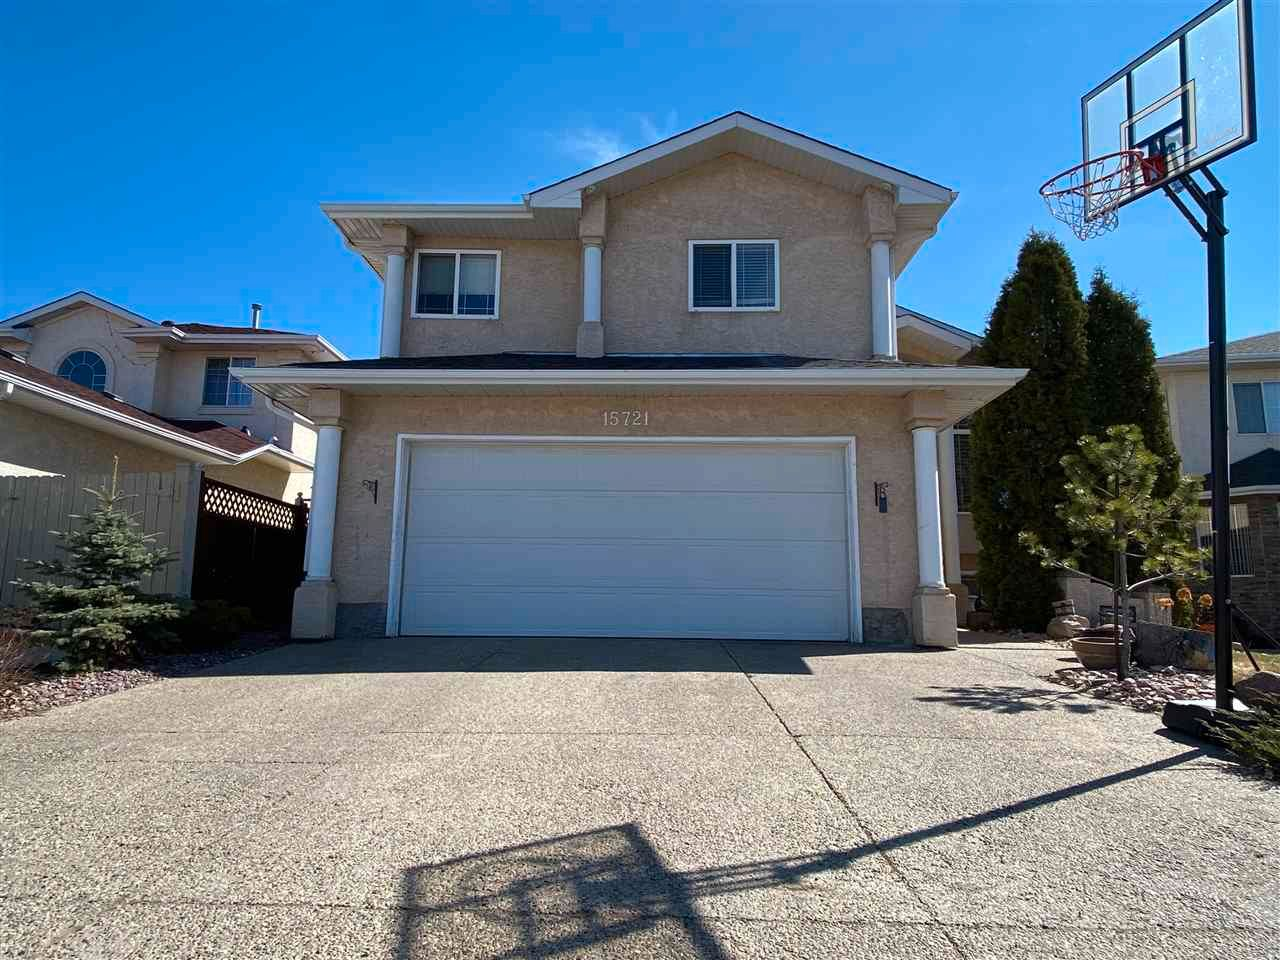 Main Photo: 15721 90 Street in Edmonton: Zone 28 House for sale : MLS®# E4235537